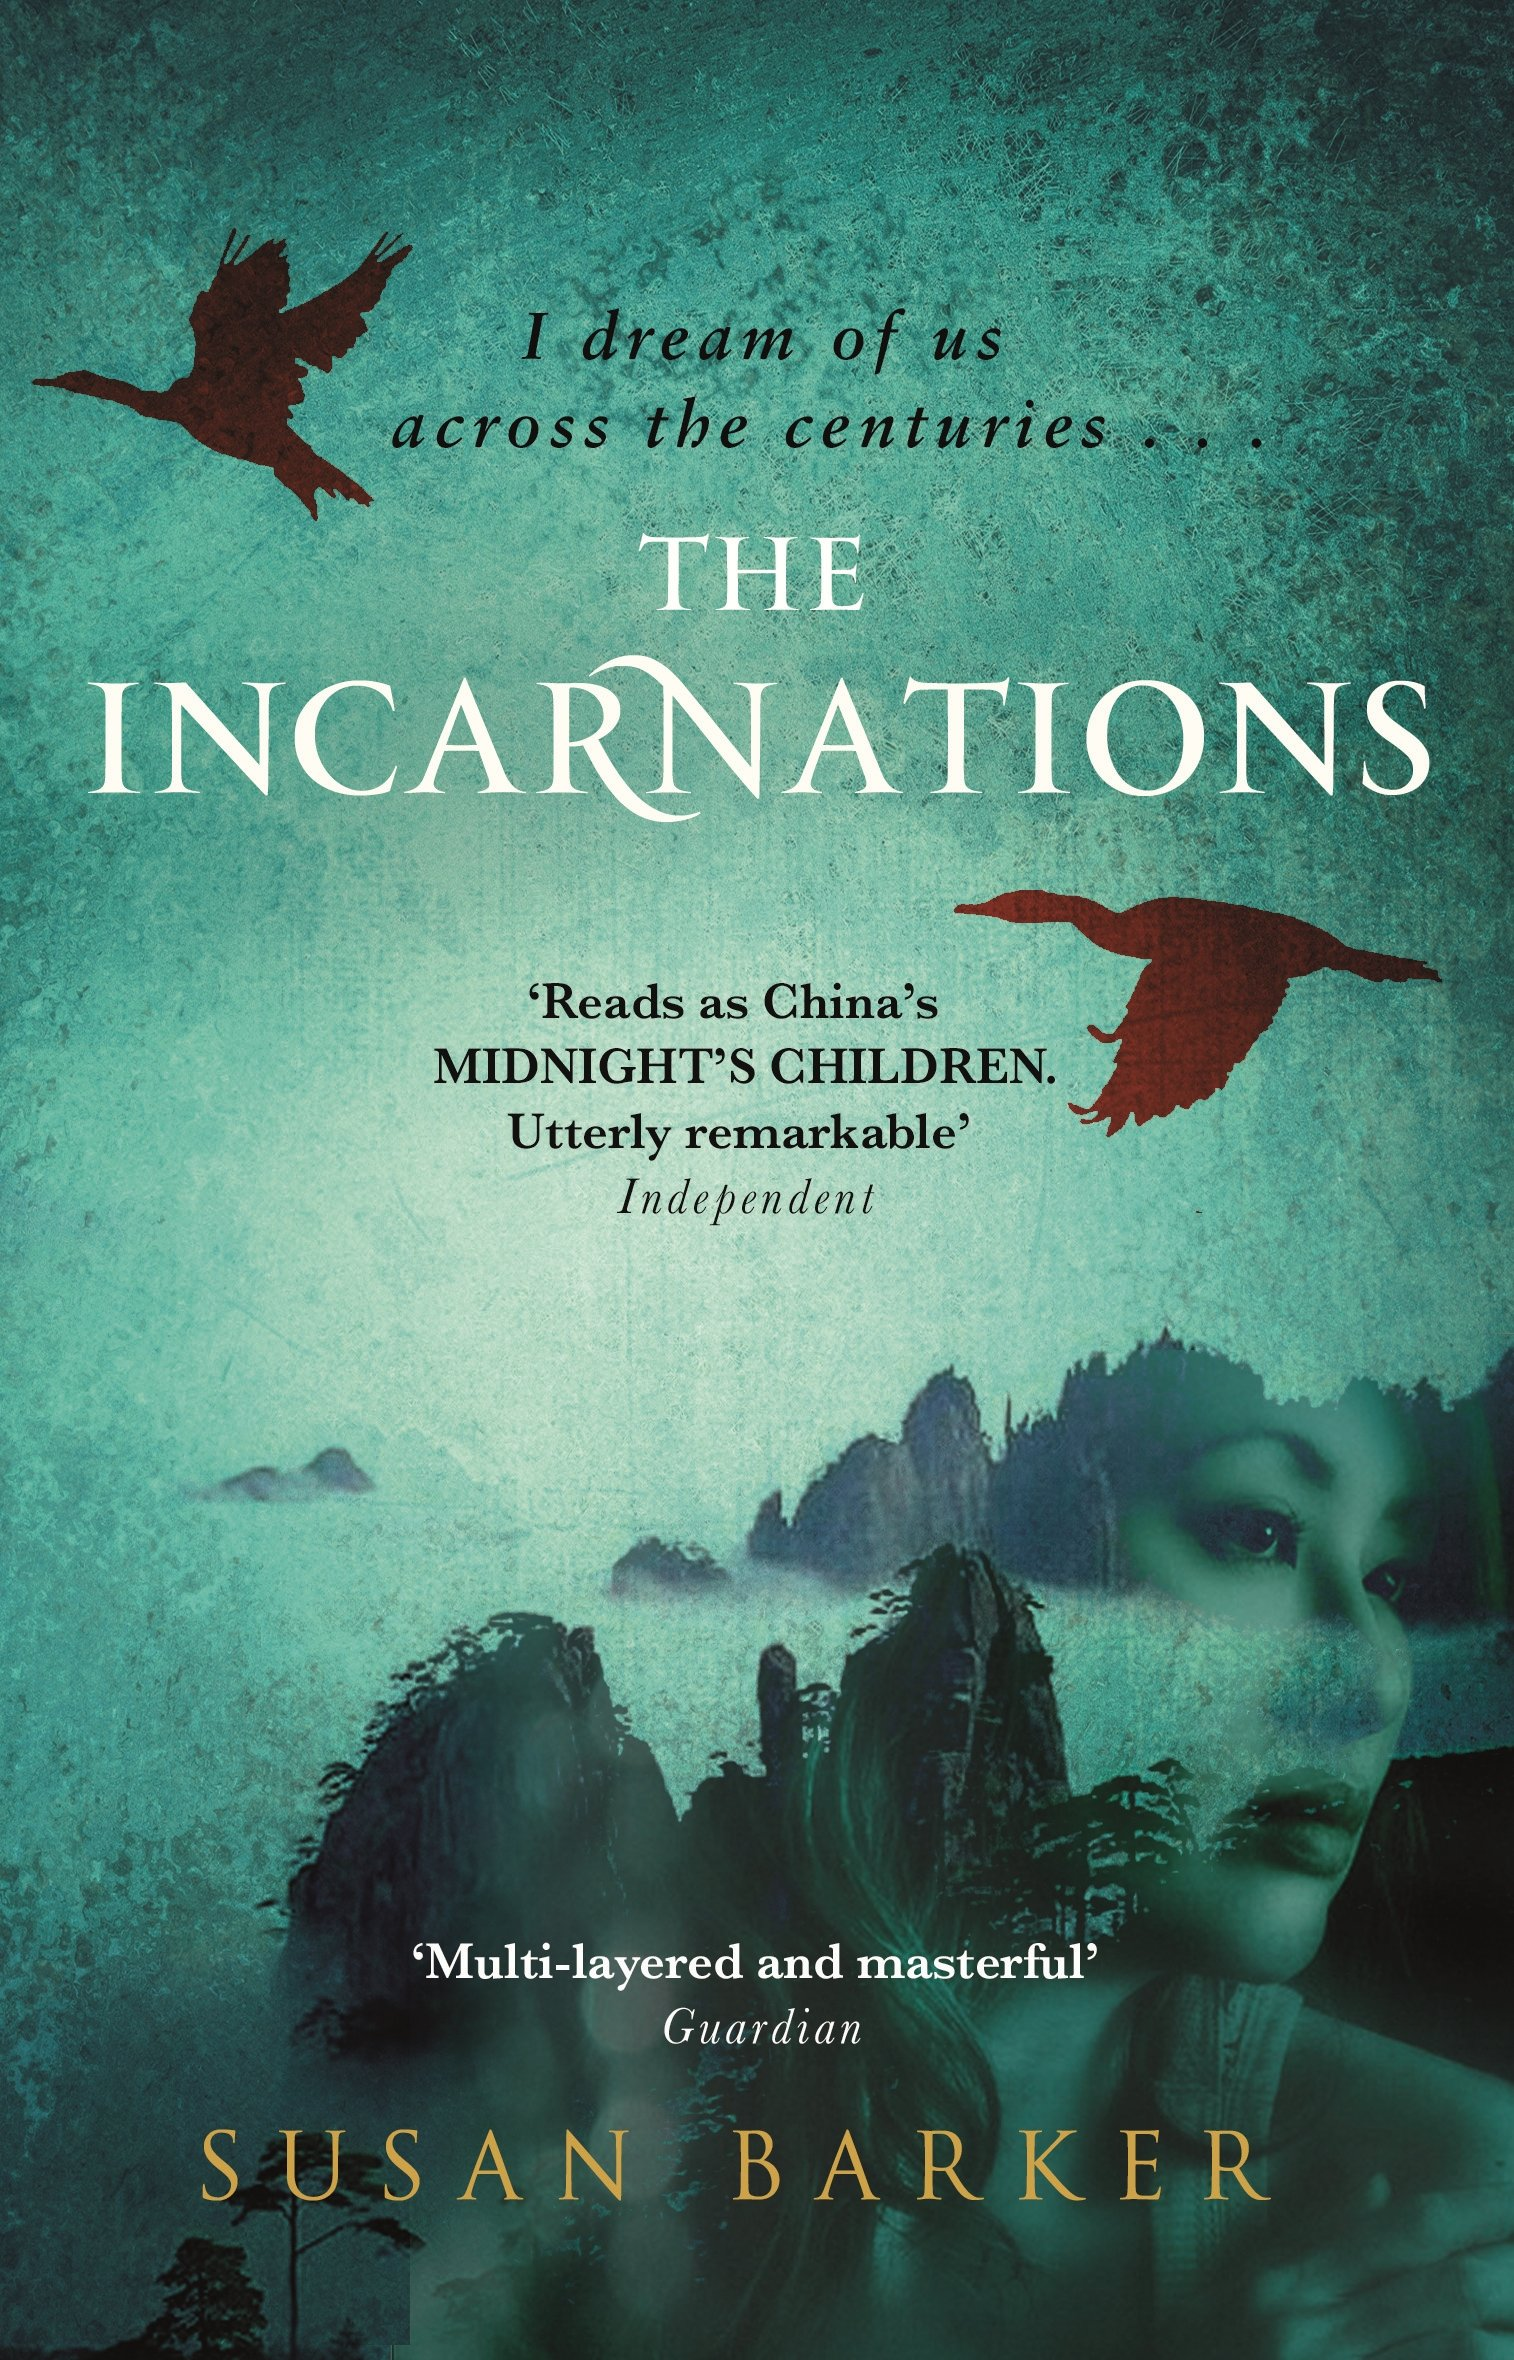 The Incarnations: Amazon.co.uk: Susan Barker: 9781784160005: Books